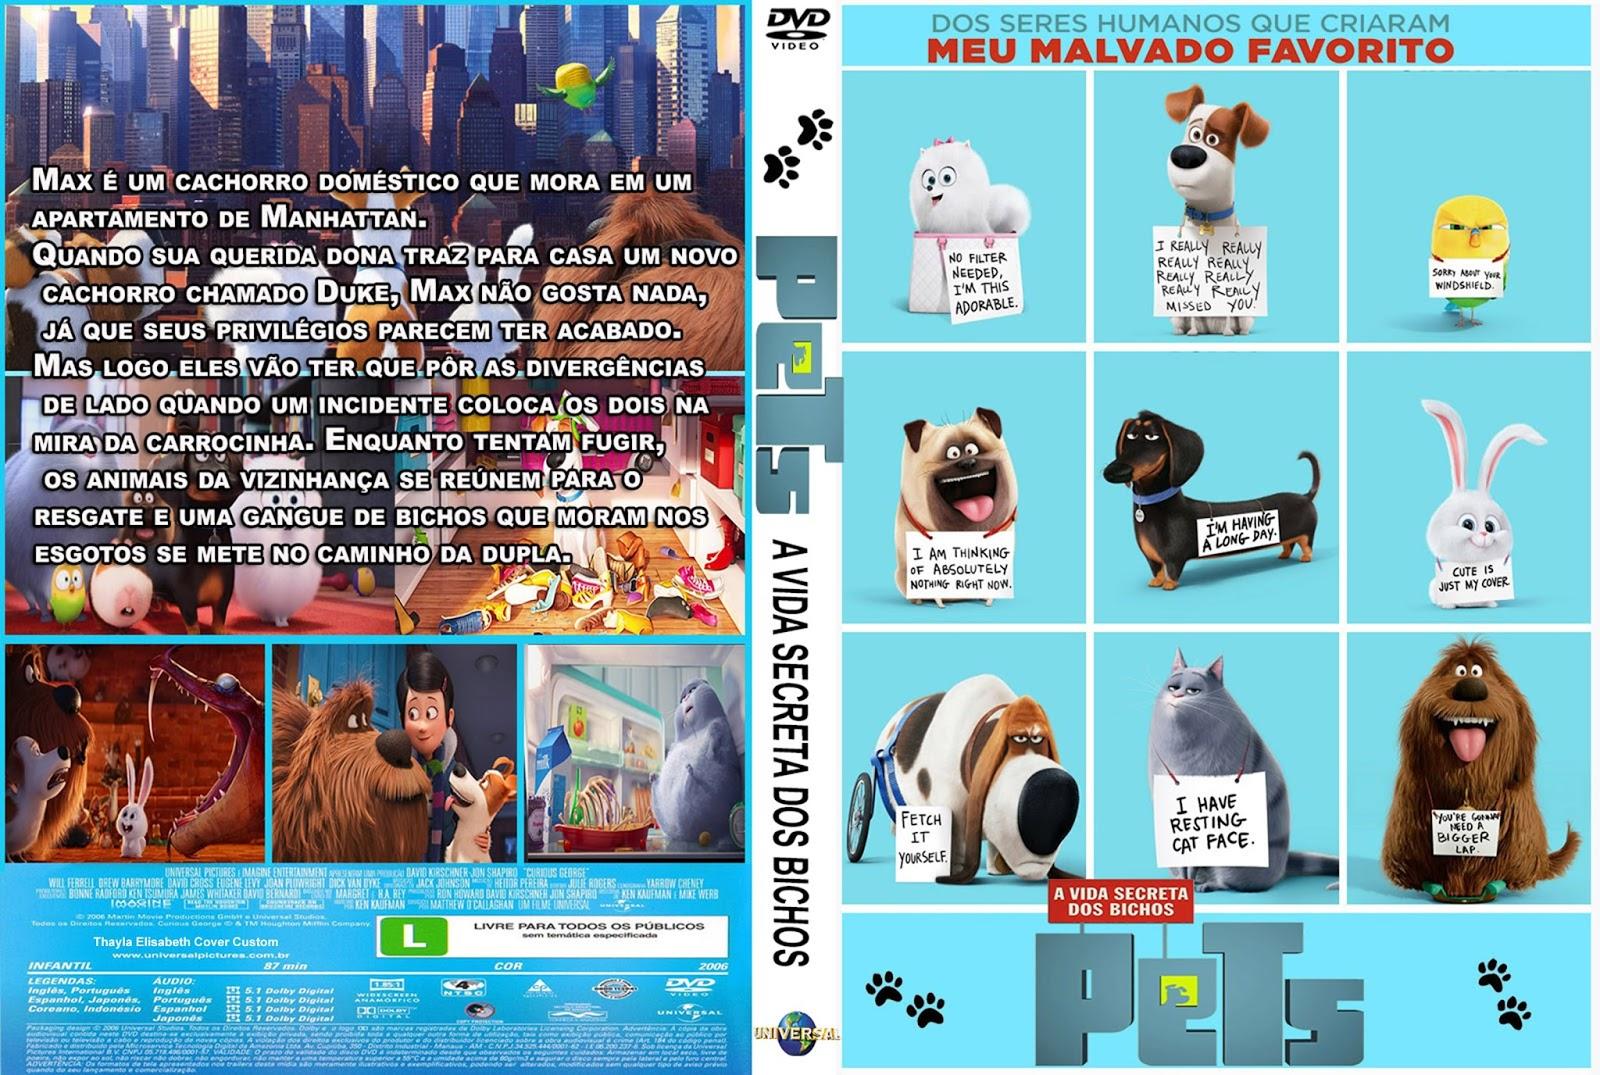 Download Pets A Vida Secreta dos Bichos BDRip Dual Áudio Download Pets A Vida Secreta dos Bichos BDRip Dual Áudio Pets 2B  2BA 2BVida 2BSecreta 2Bdos 2BBichos